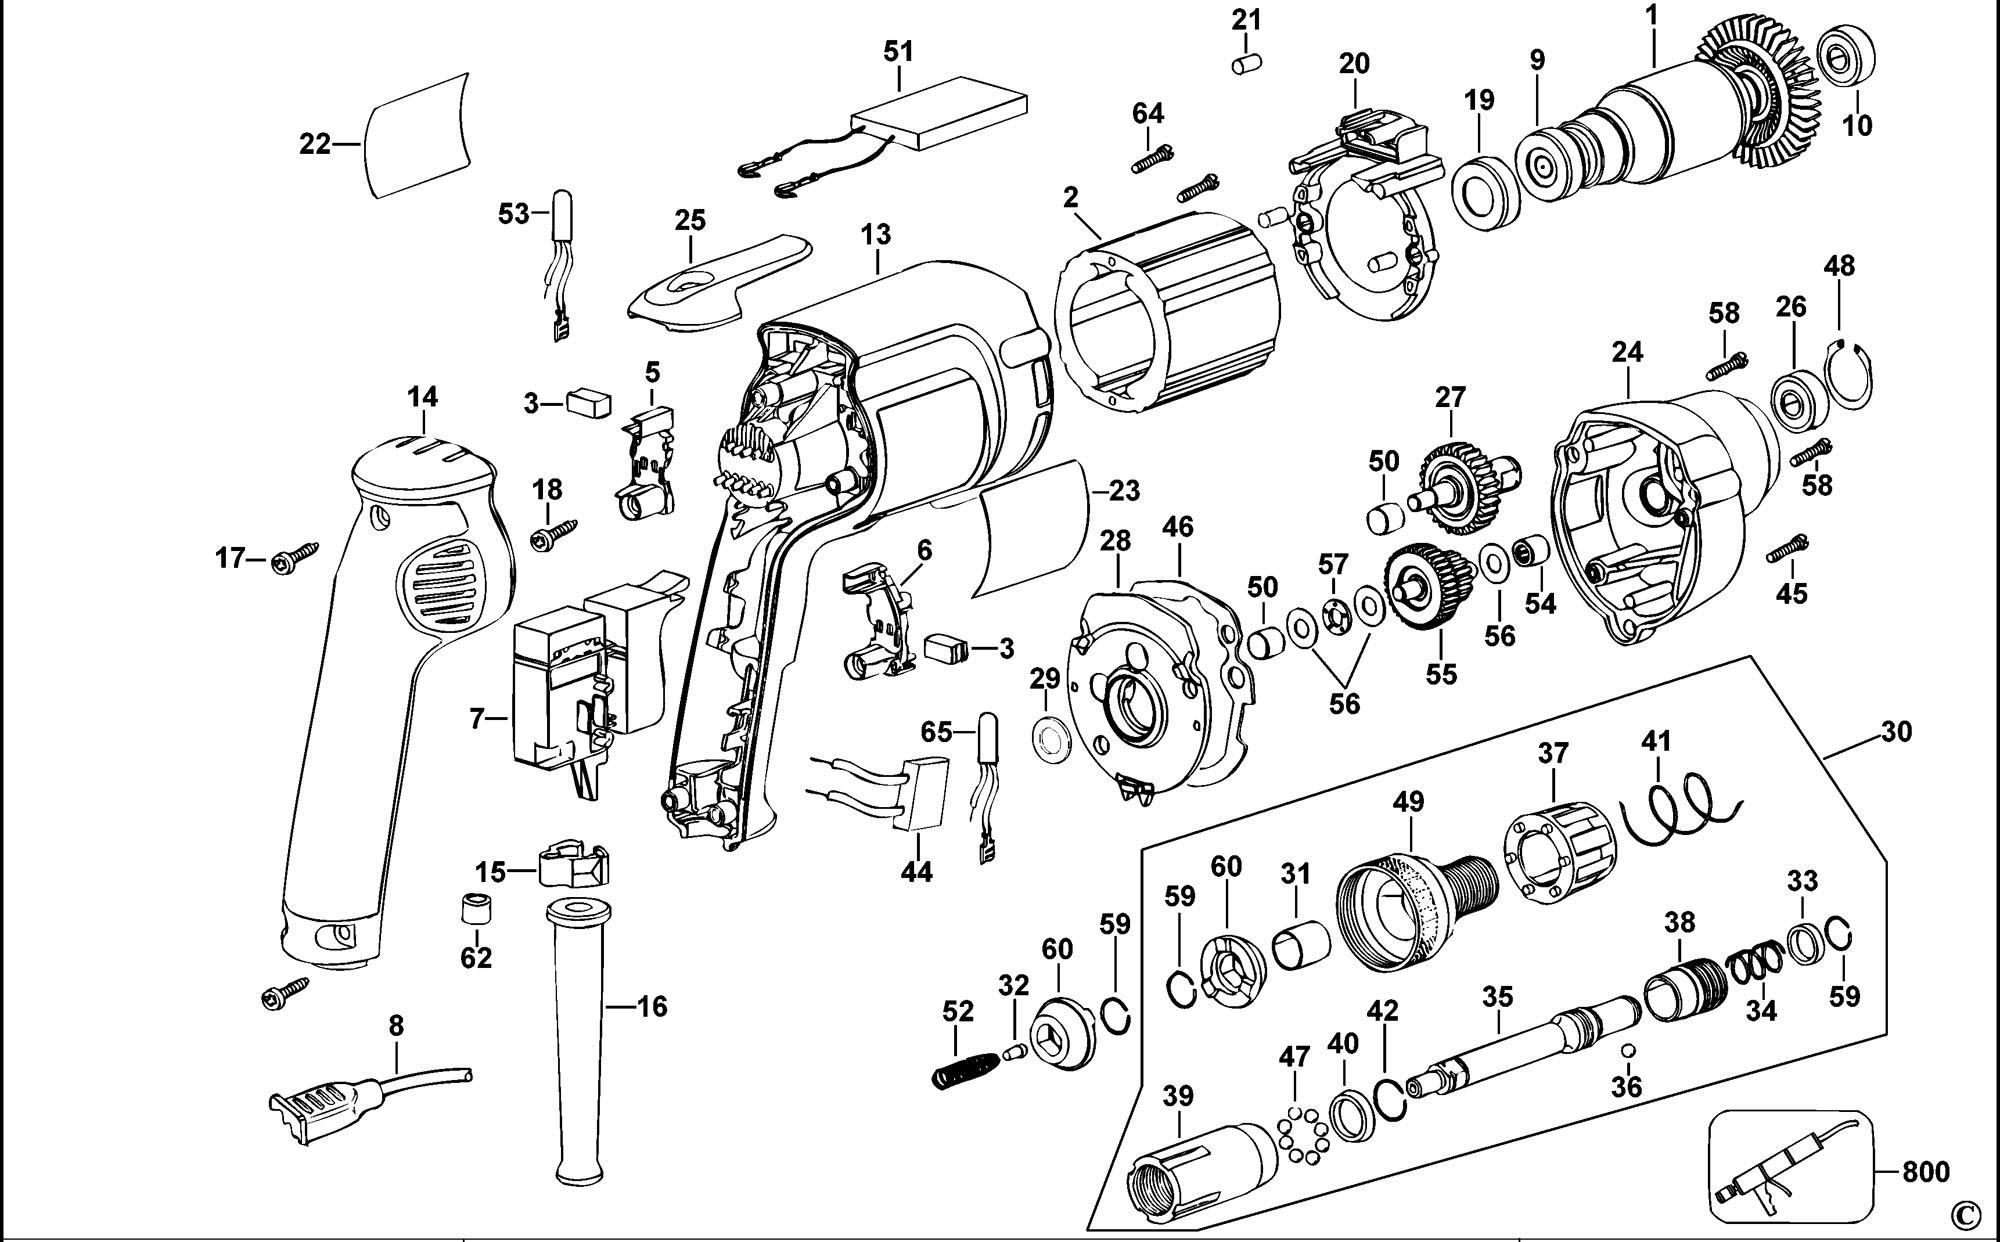 Spares For Dewalt Dw268 Screwdriver Type A4 Spare Dw268